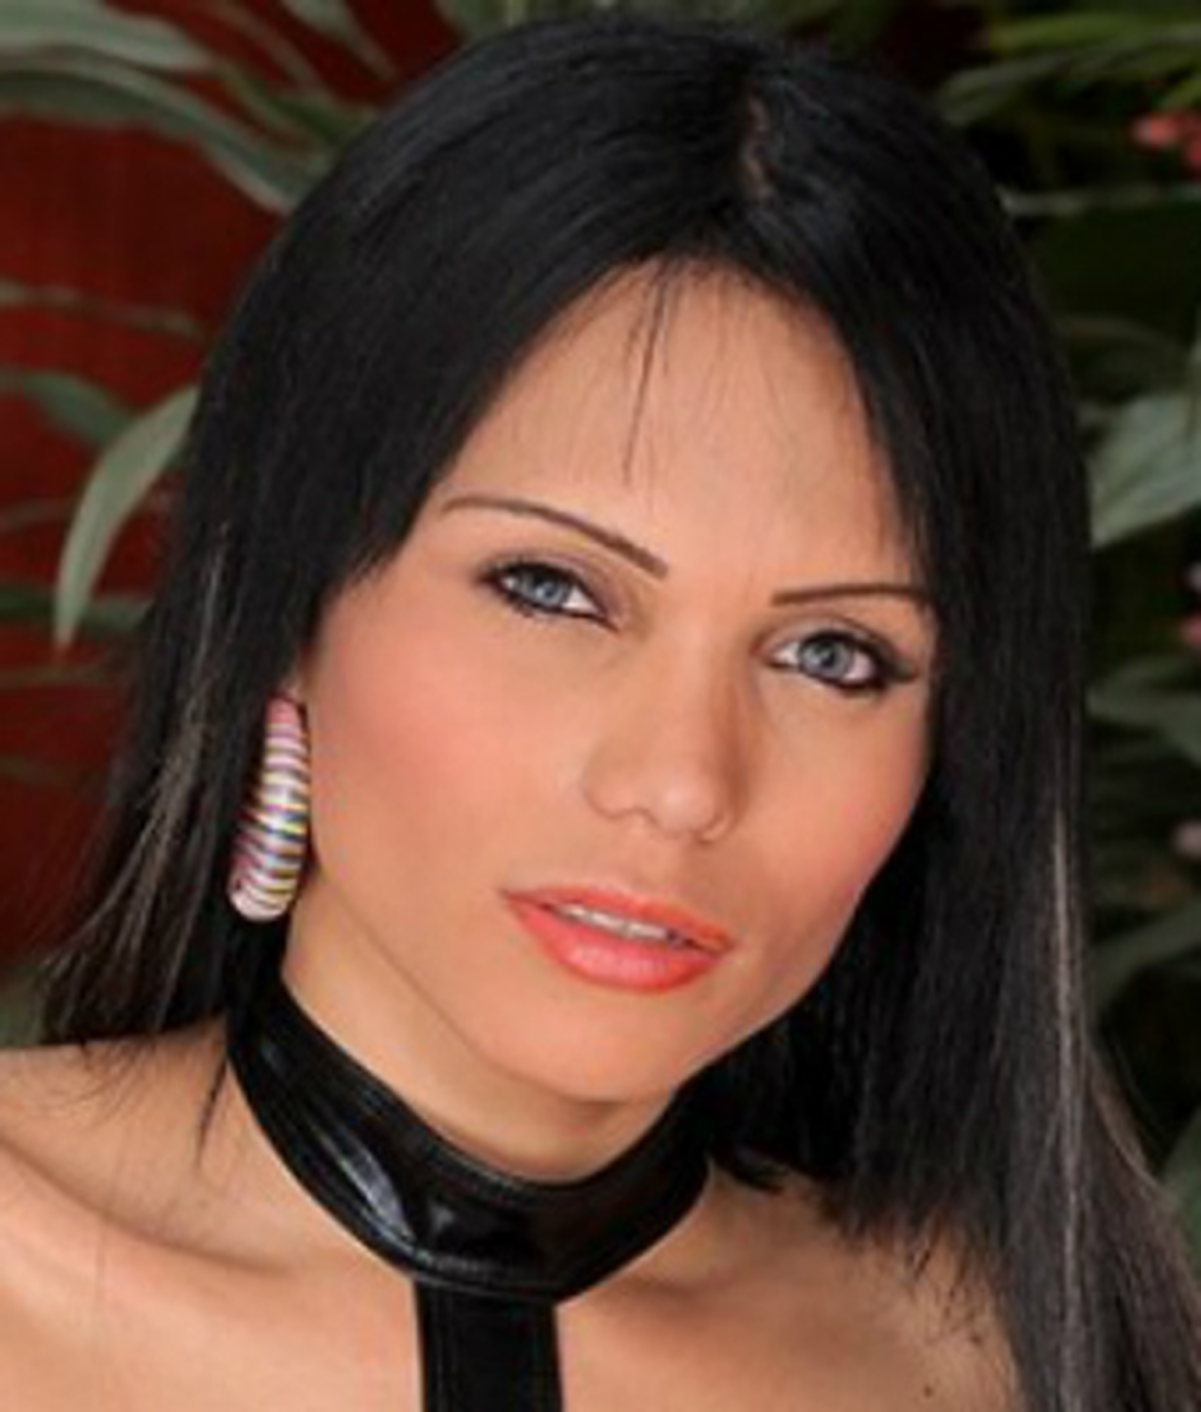 Sofia Obregon